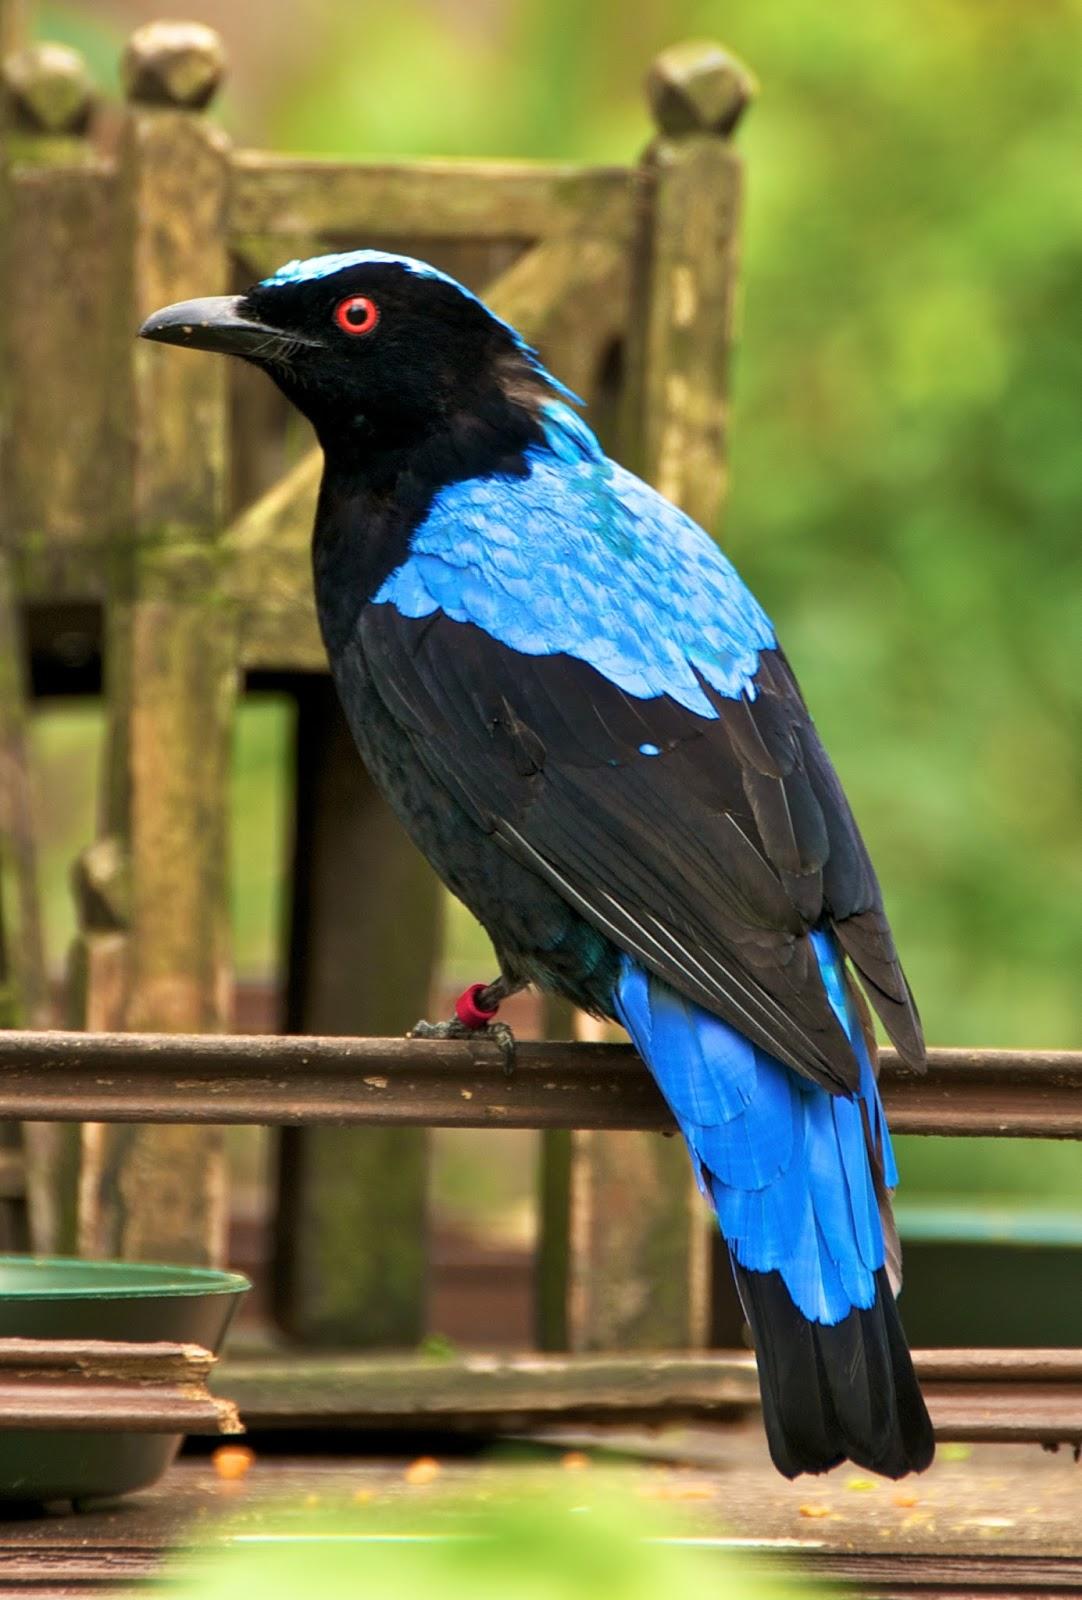 Adu Kicauan Terbaik Burung Cucak Biru Vs Cendet Harga Burung Pentet Vs Gonggo Lilo Foto Burung Kicau